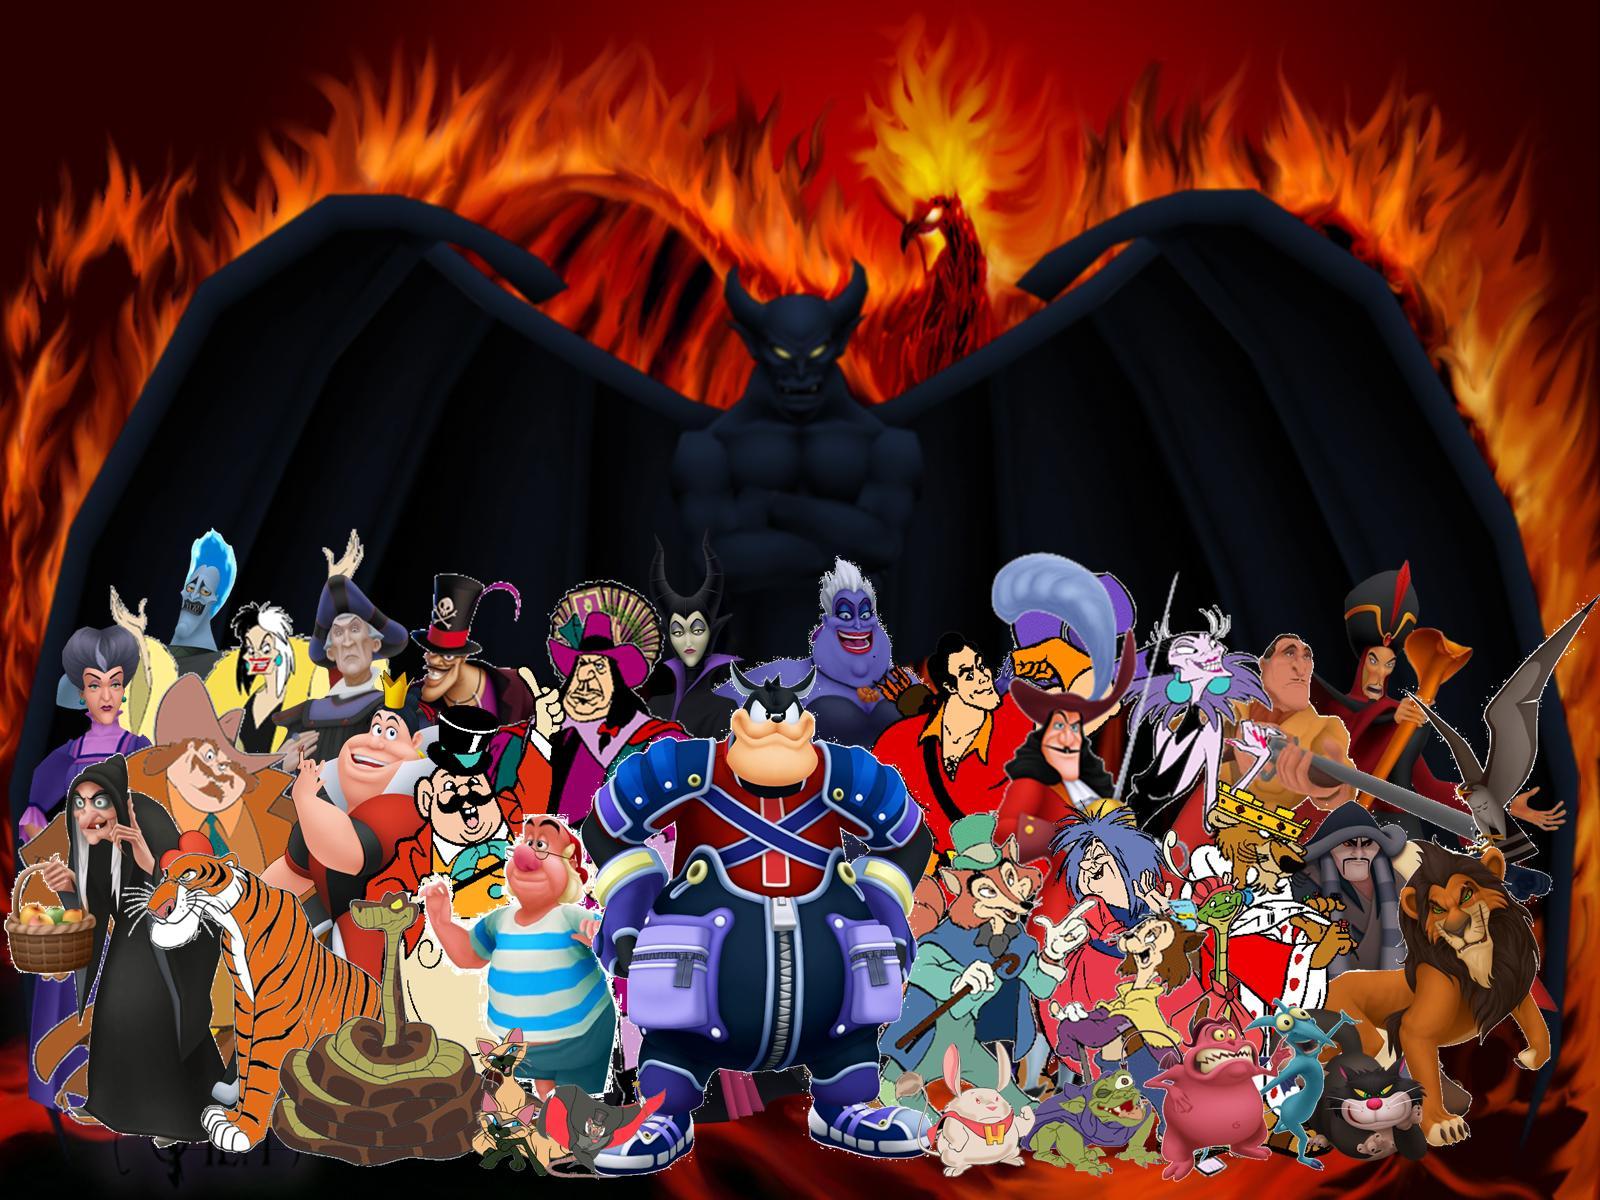 Disneys Atlantis The Villains: Immagine - Disney Evil Villains.jpg